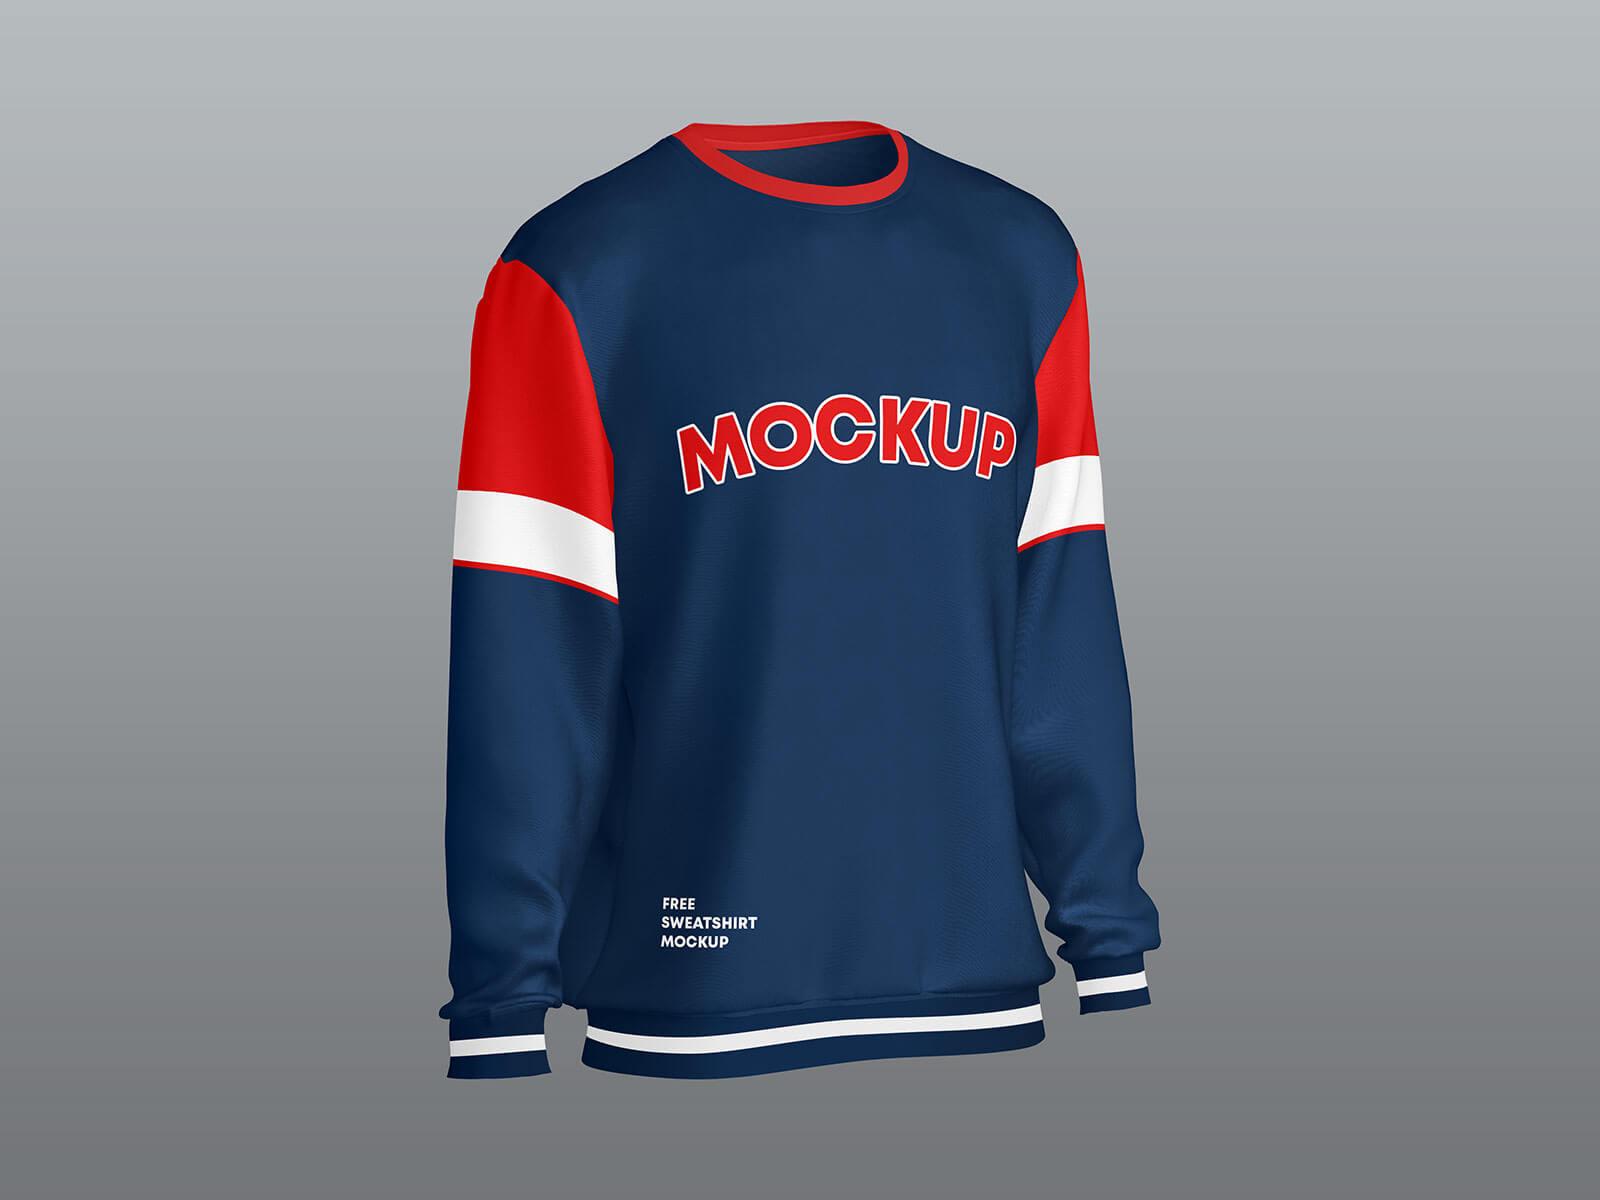 Free Crew Neck Full Sleeves Sweatshirt Mockup PSD Set (3)